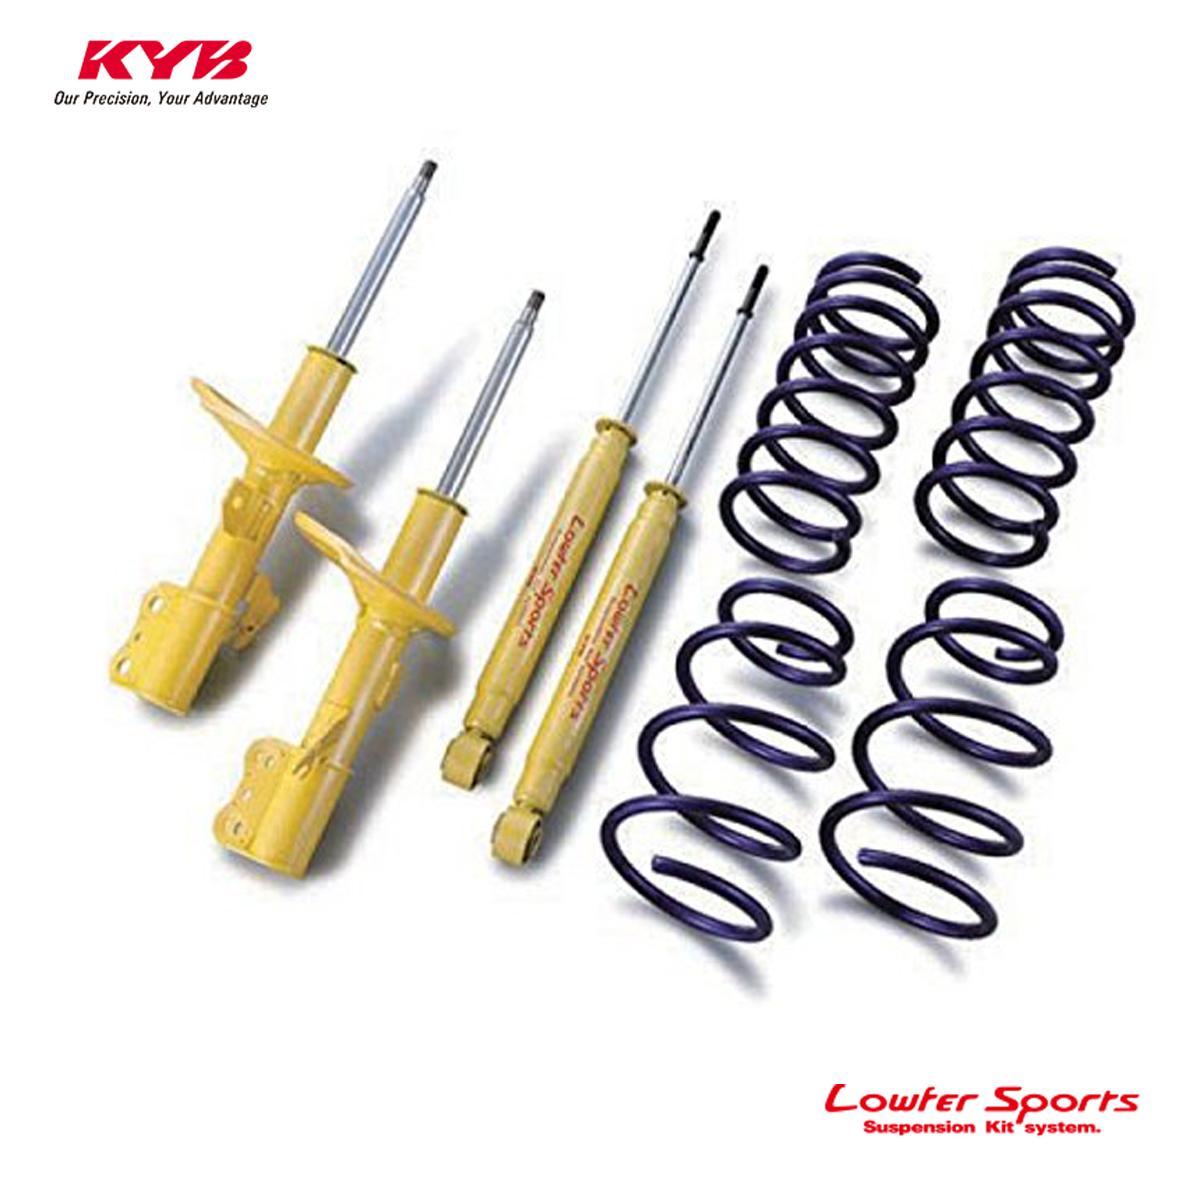 KYB カヤバ セレナ HC27 ショックアブソーバー サスペンションキット セット LOWFER SPORTS KIT LKIT-HC27 配送先条件有り